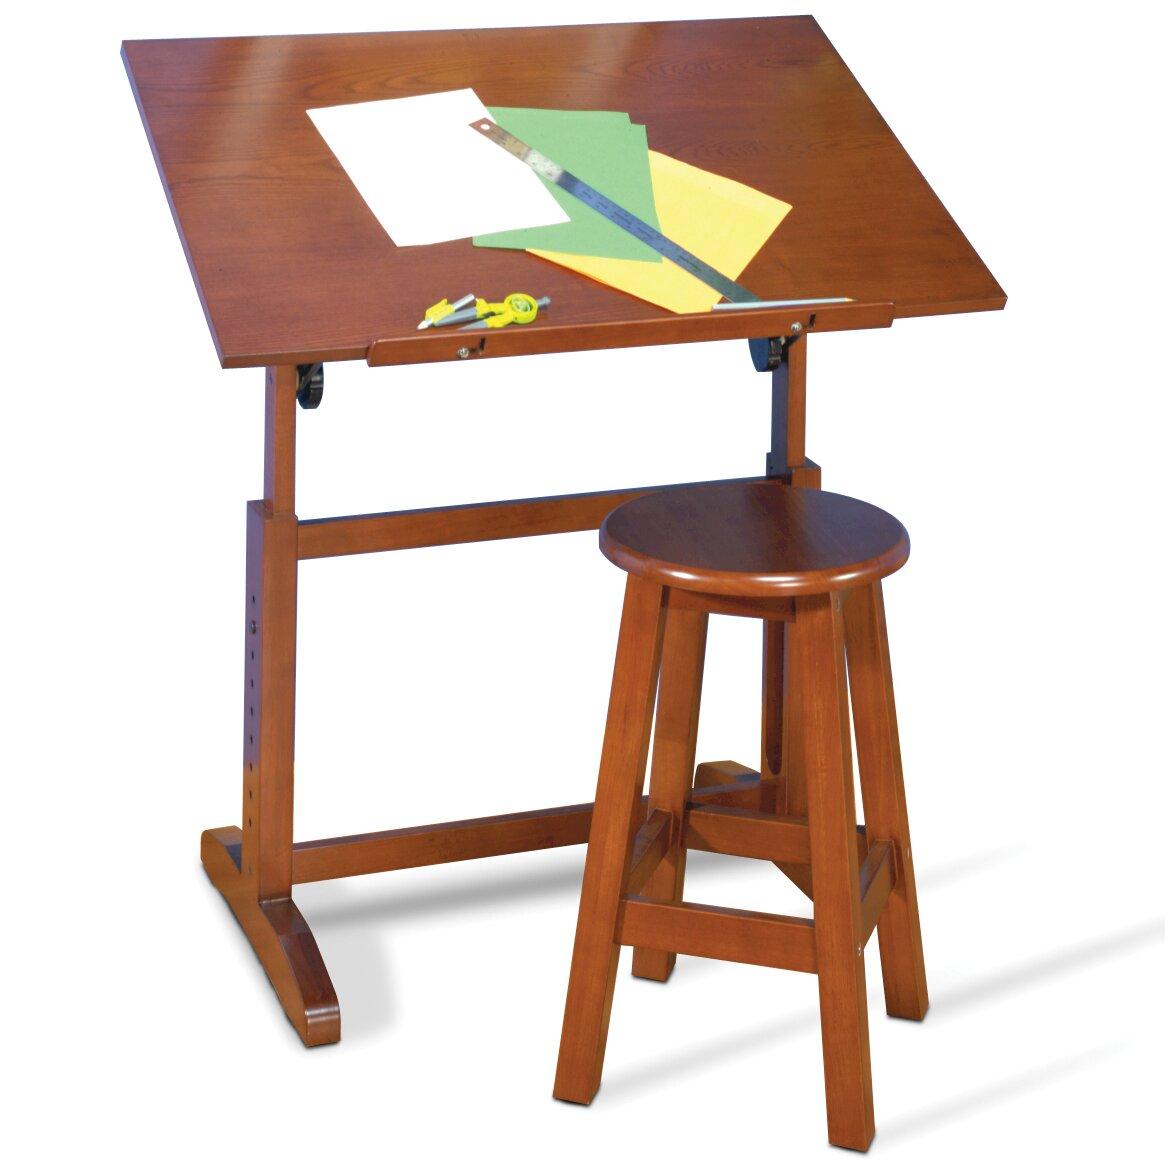 Studio Designs Creative Hardwood 36 Quot W X 24 Quot D Drafting